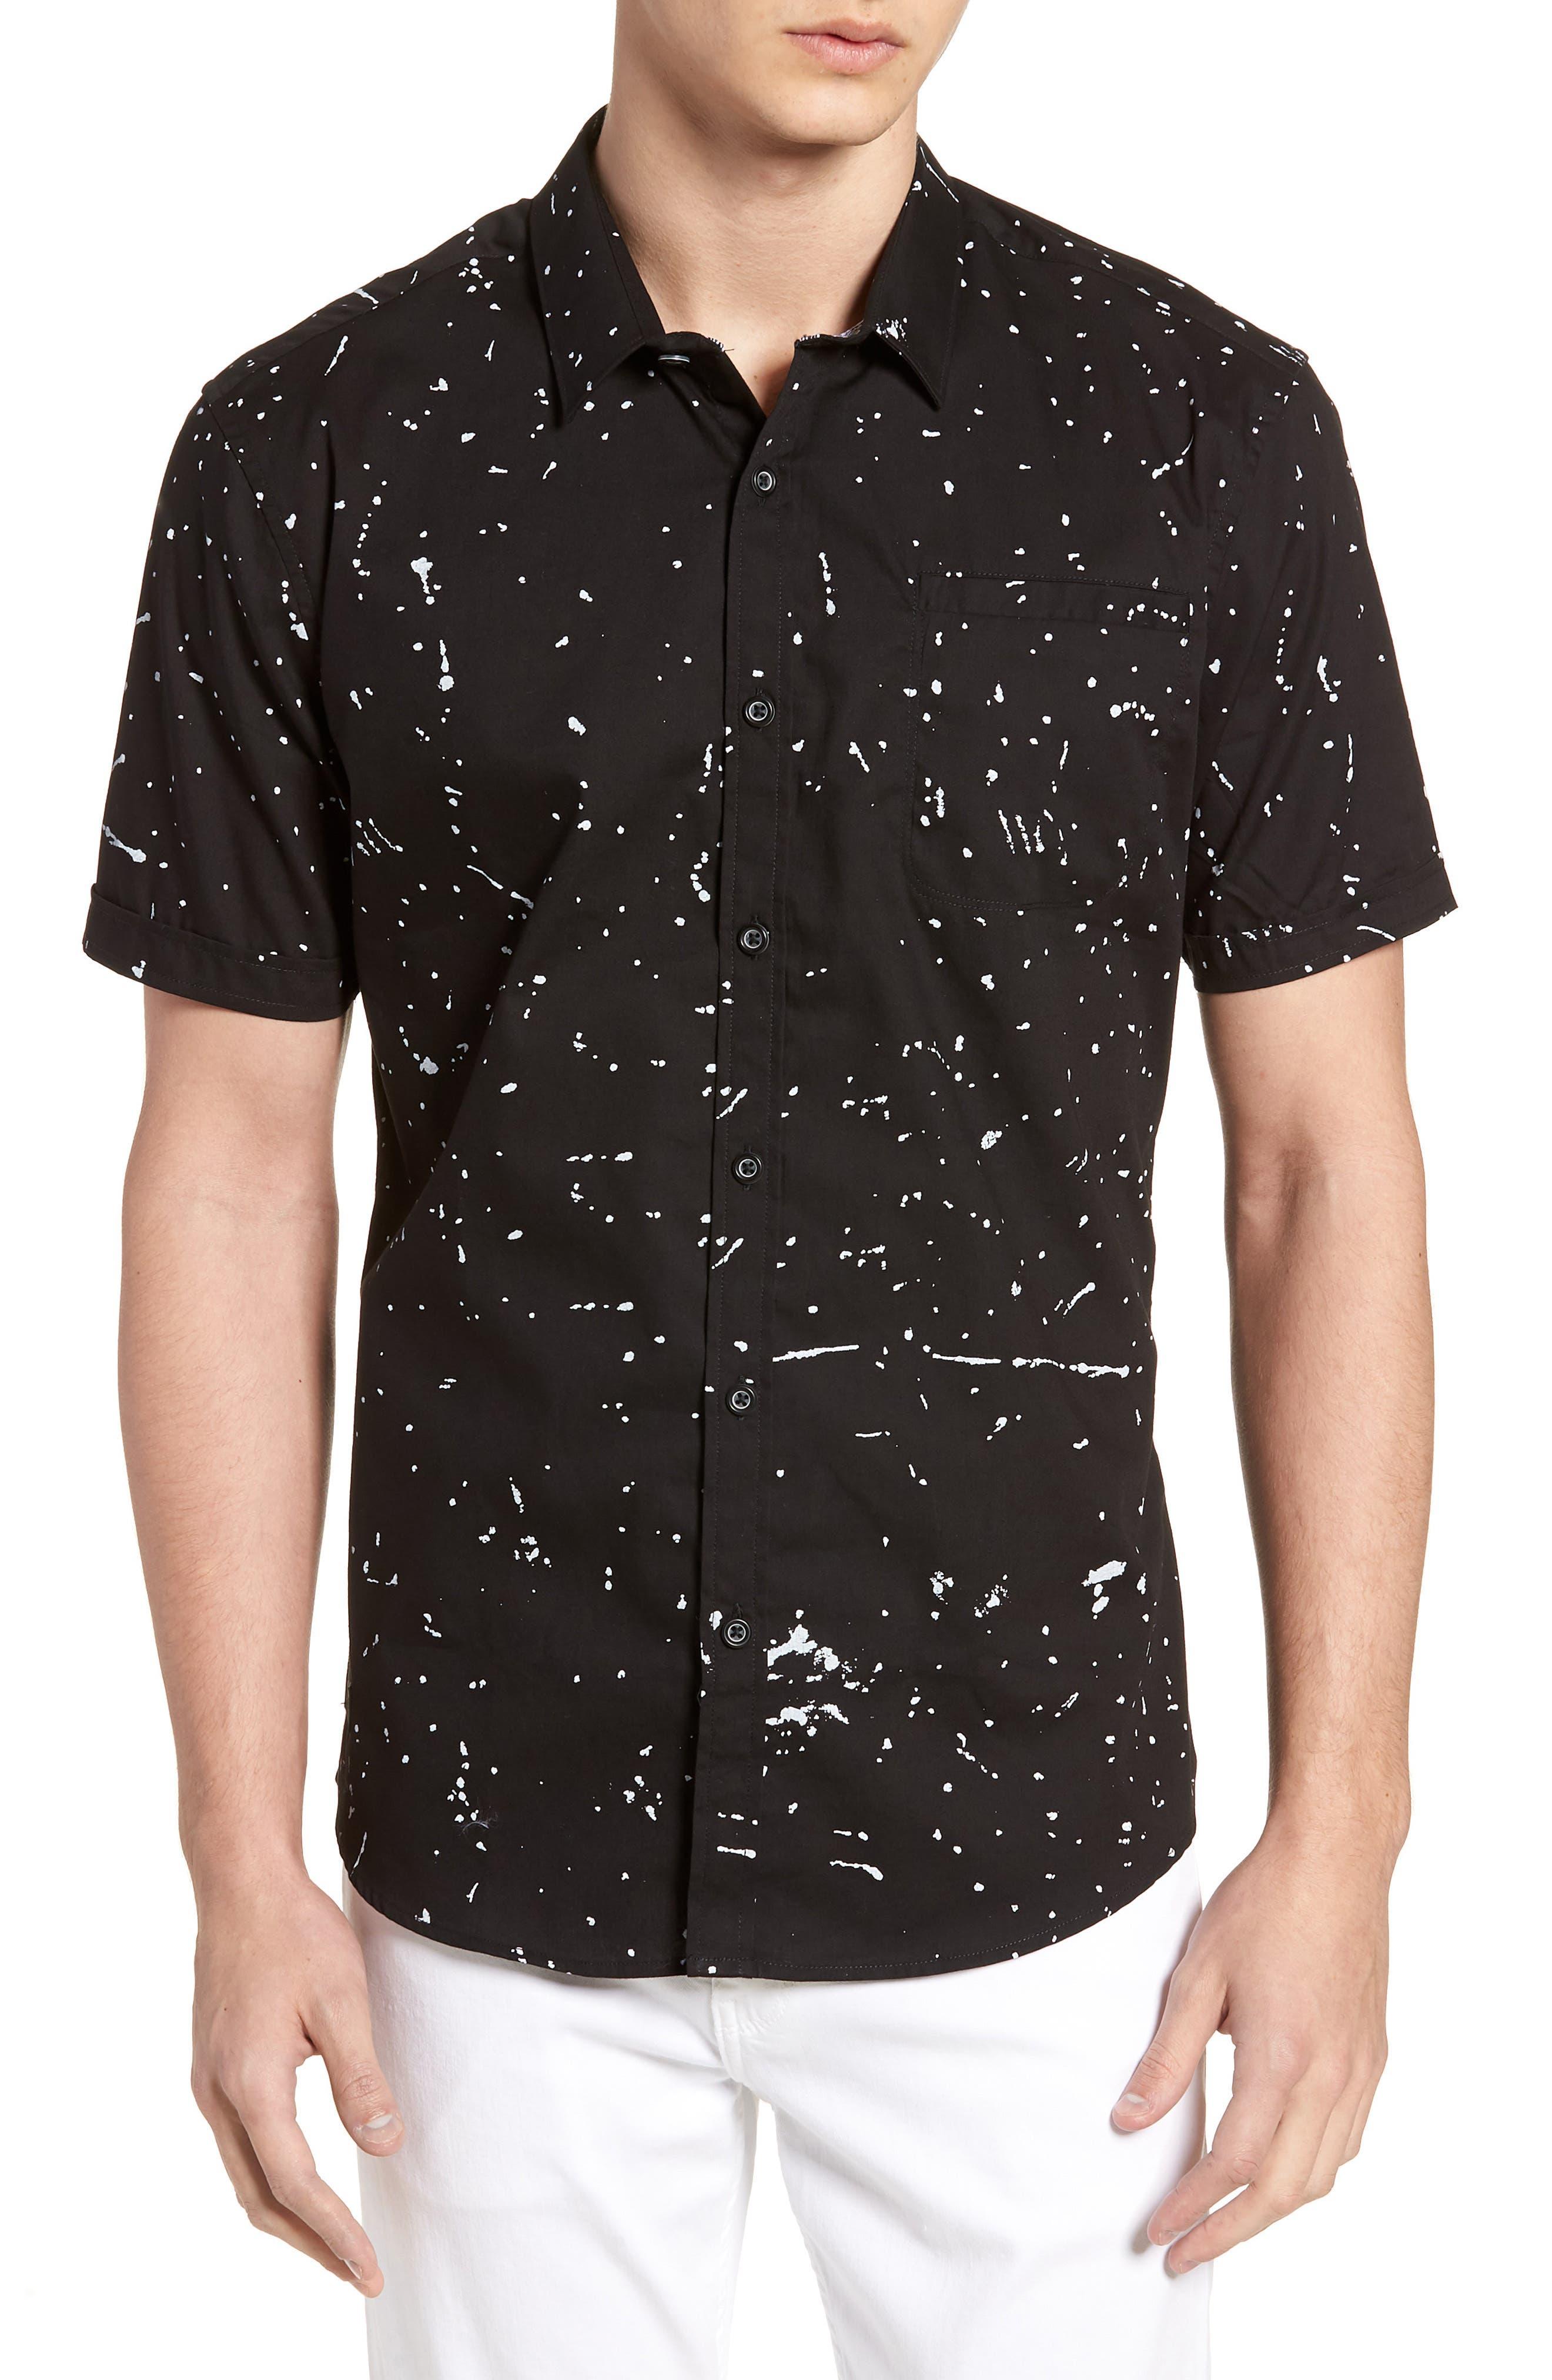 Sky Walker Splatter Sport Shirt,                         Main,                         color, Black